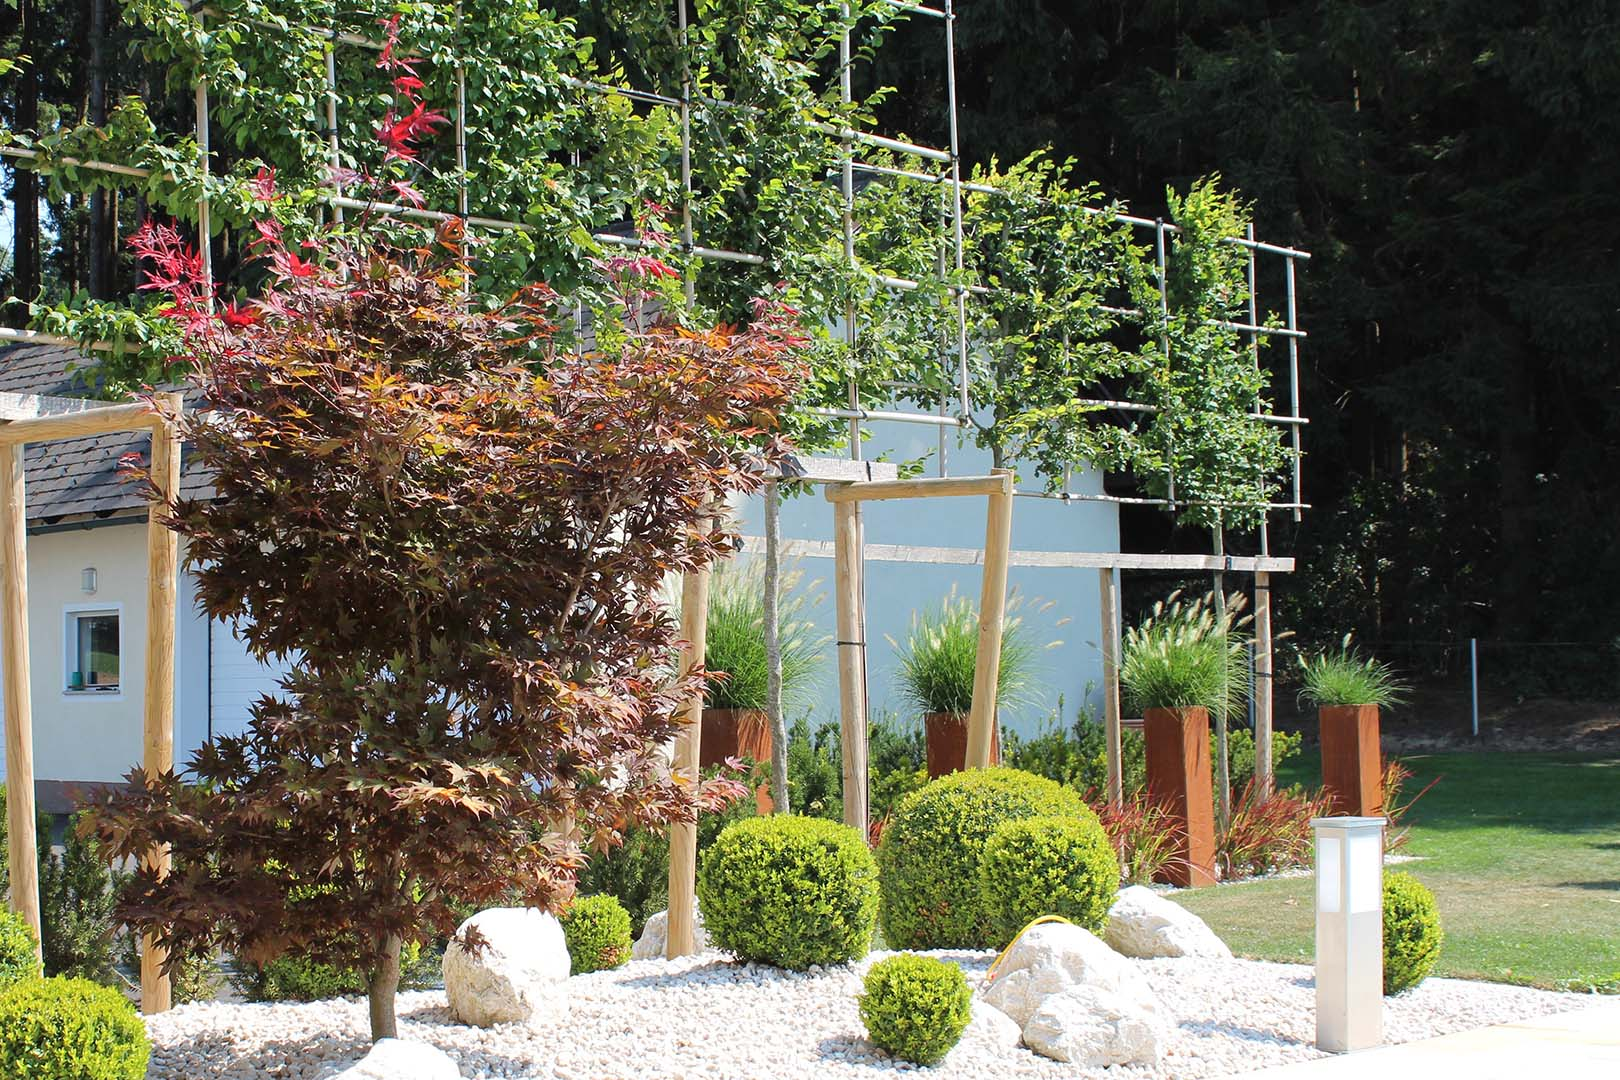 Gartengestaltung Grünpfalnzen